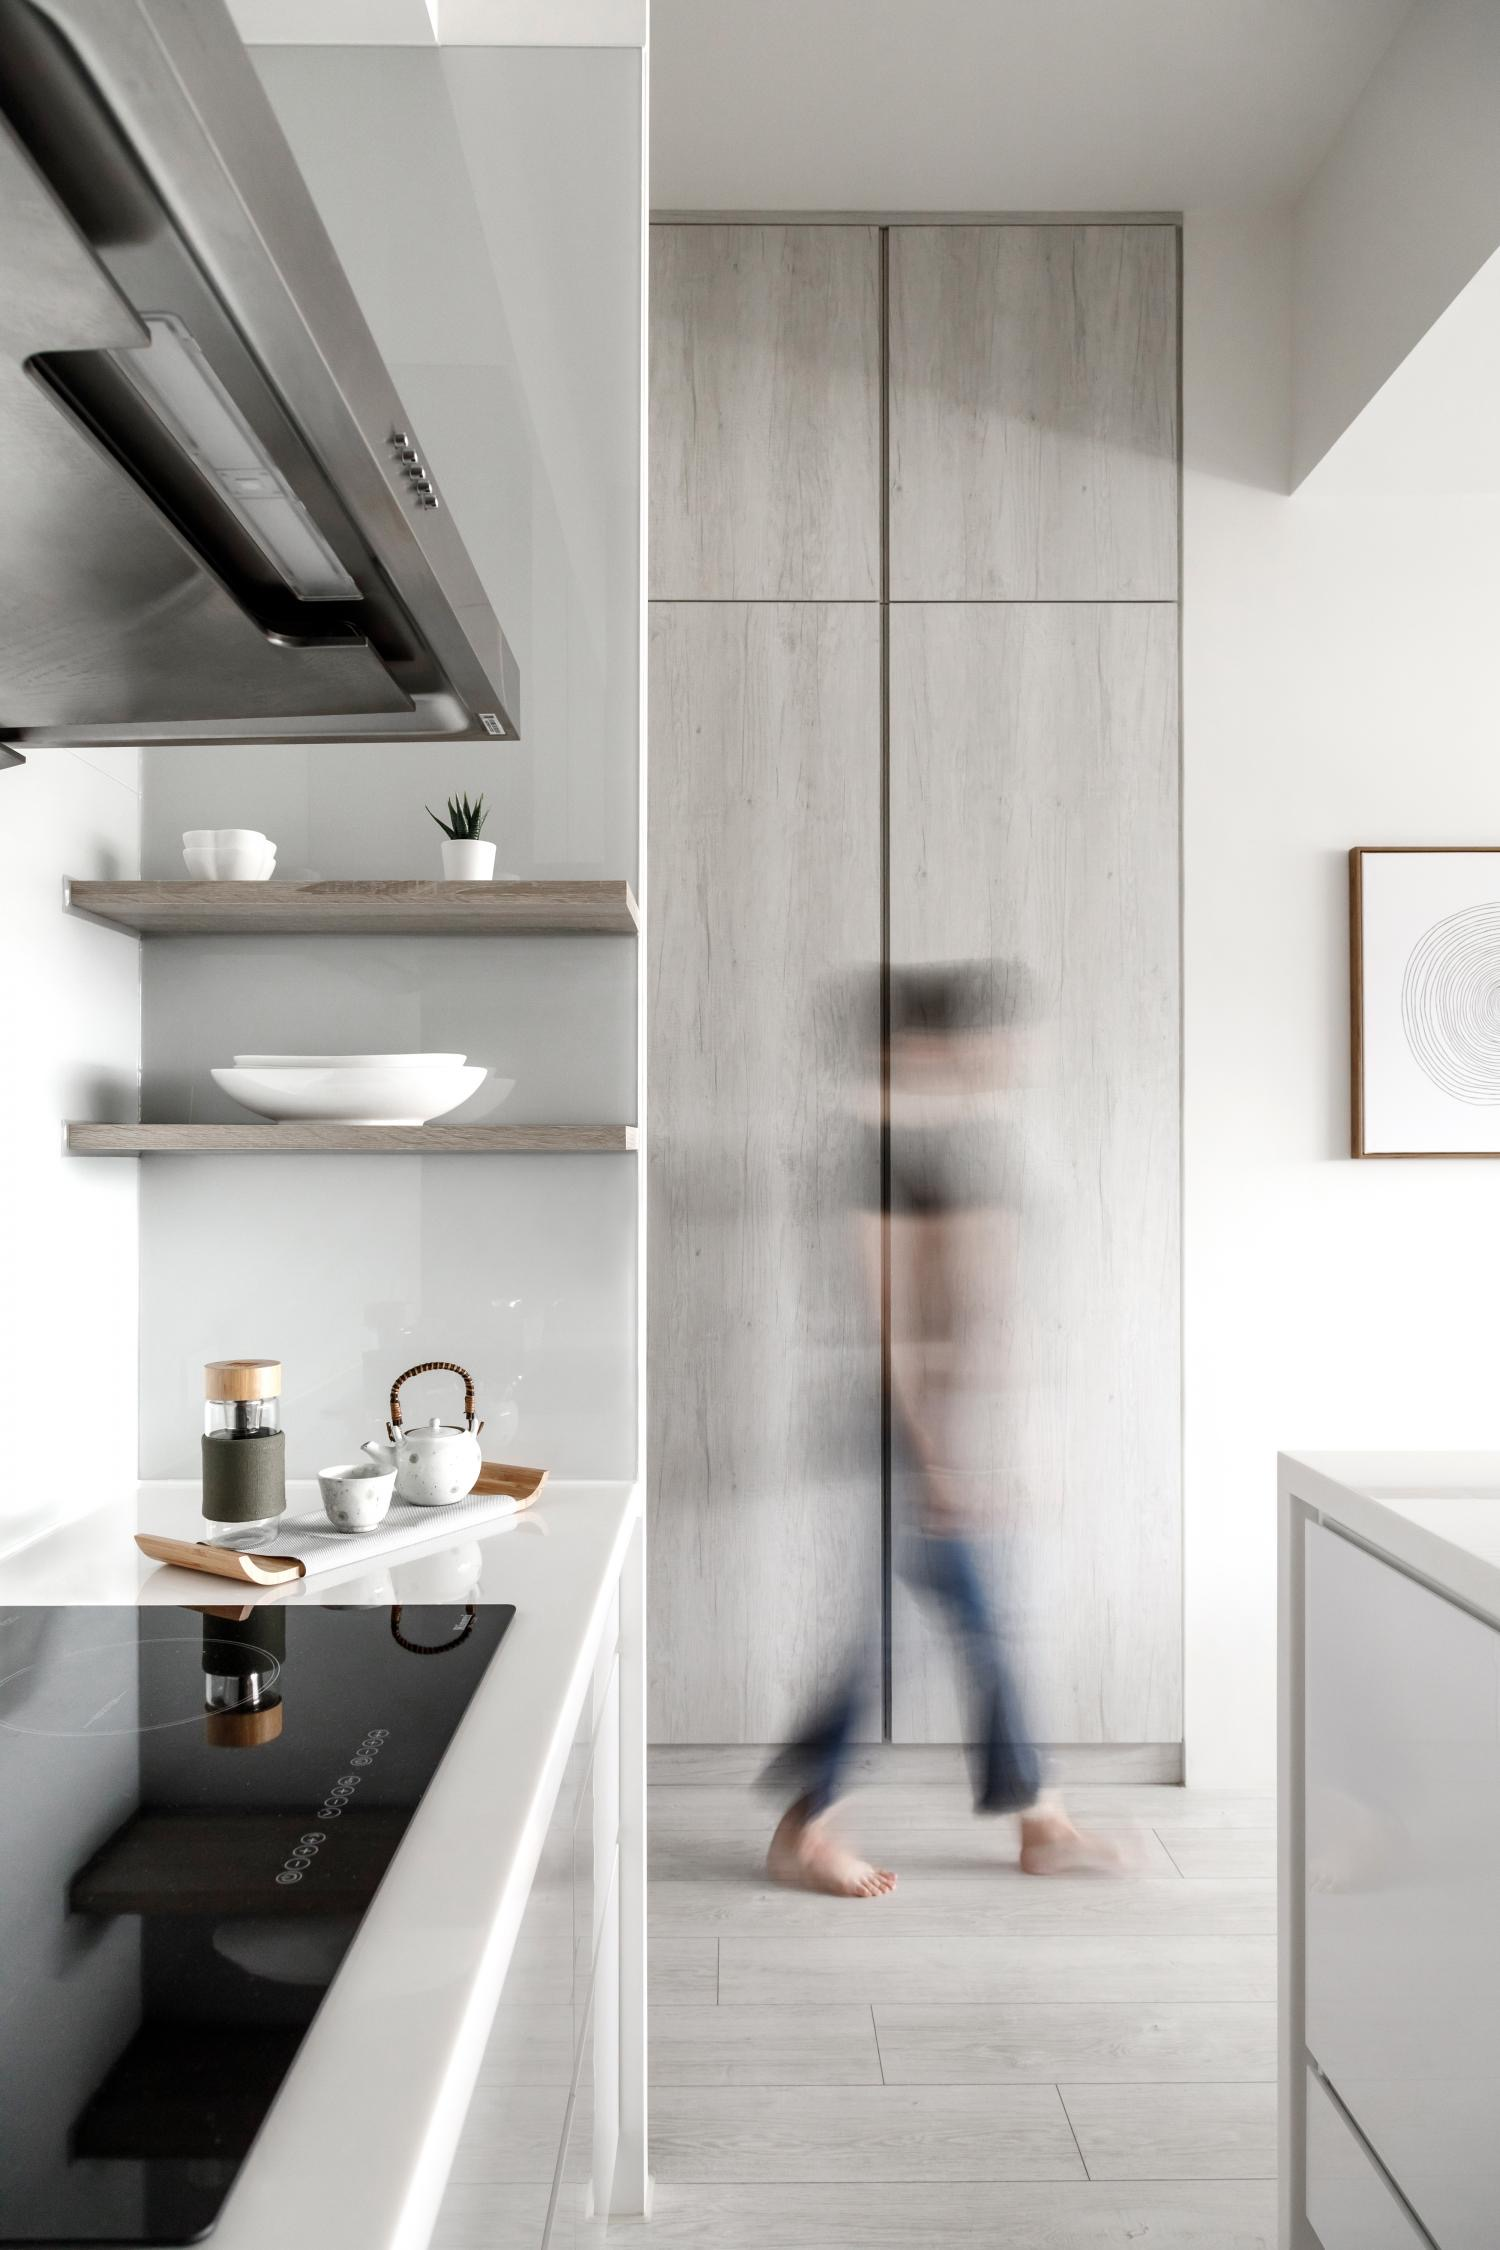 Interior Image 406